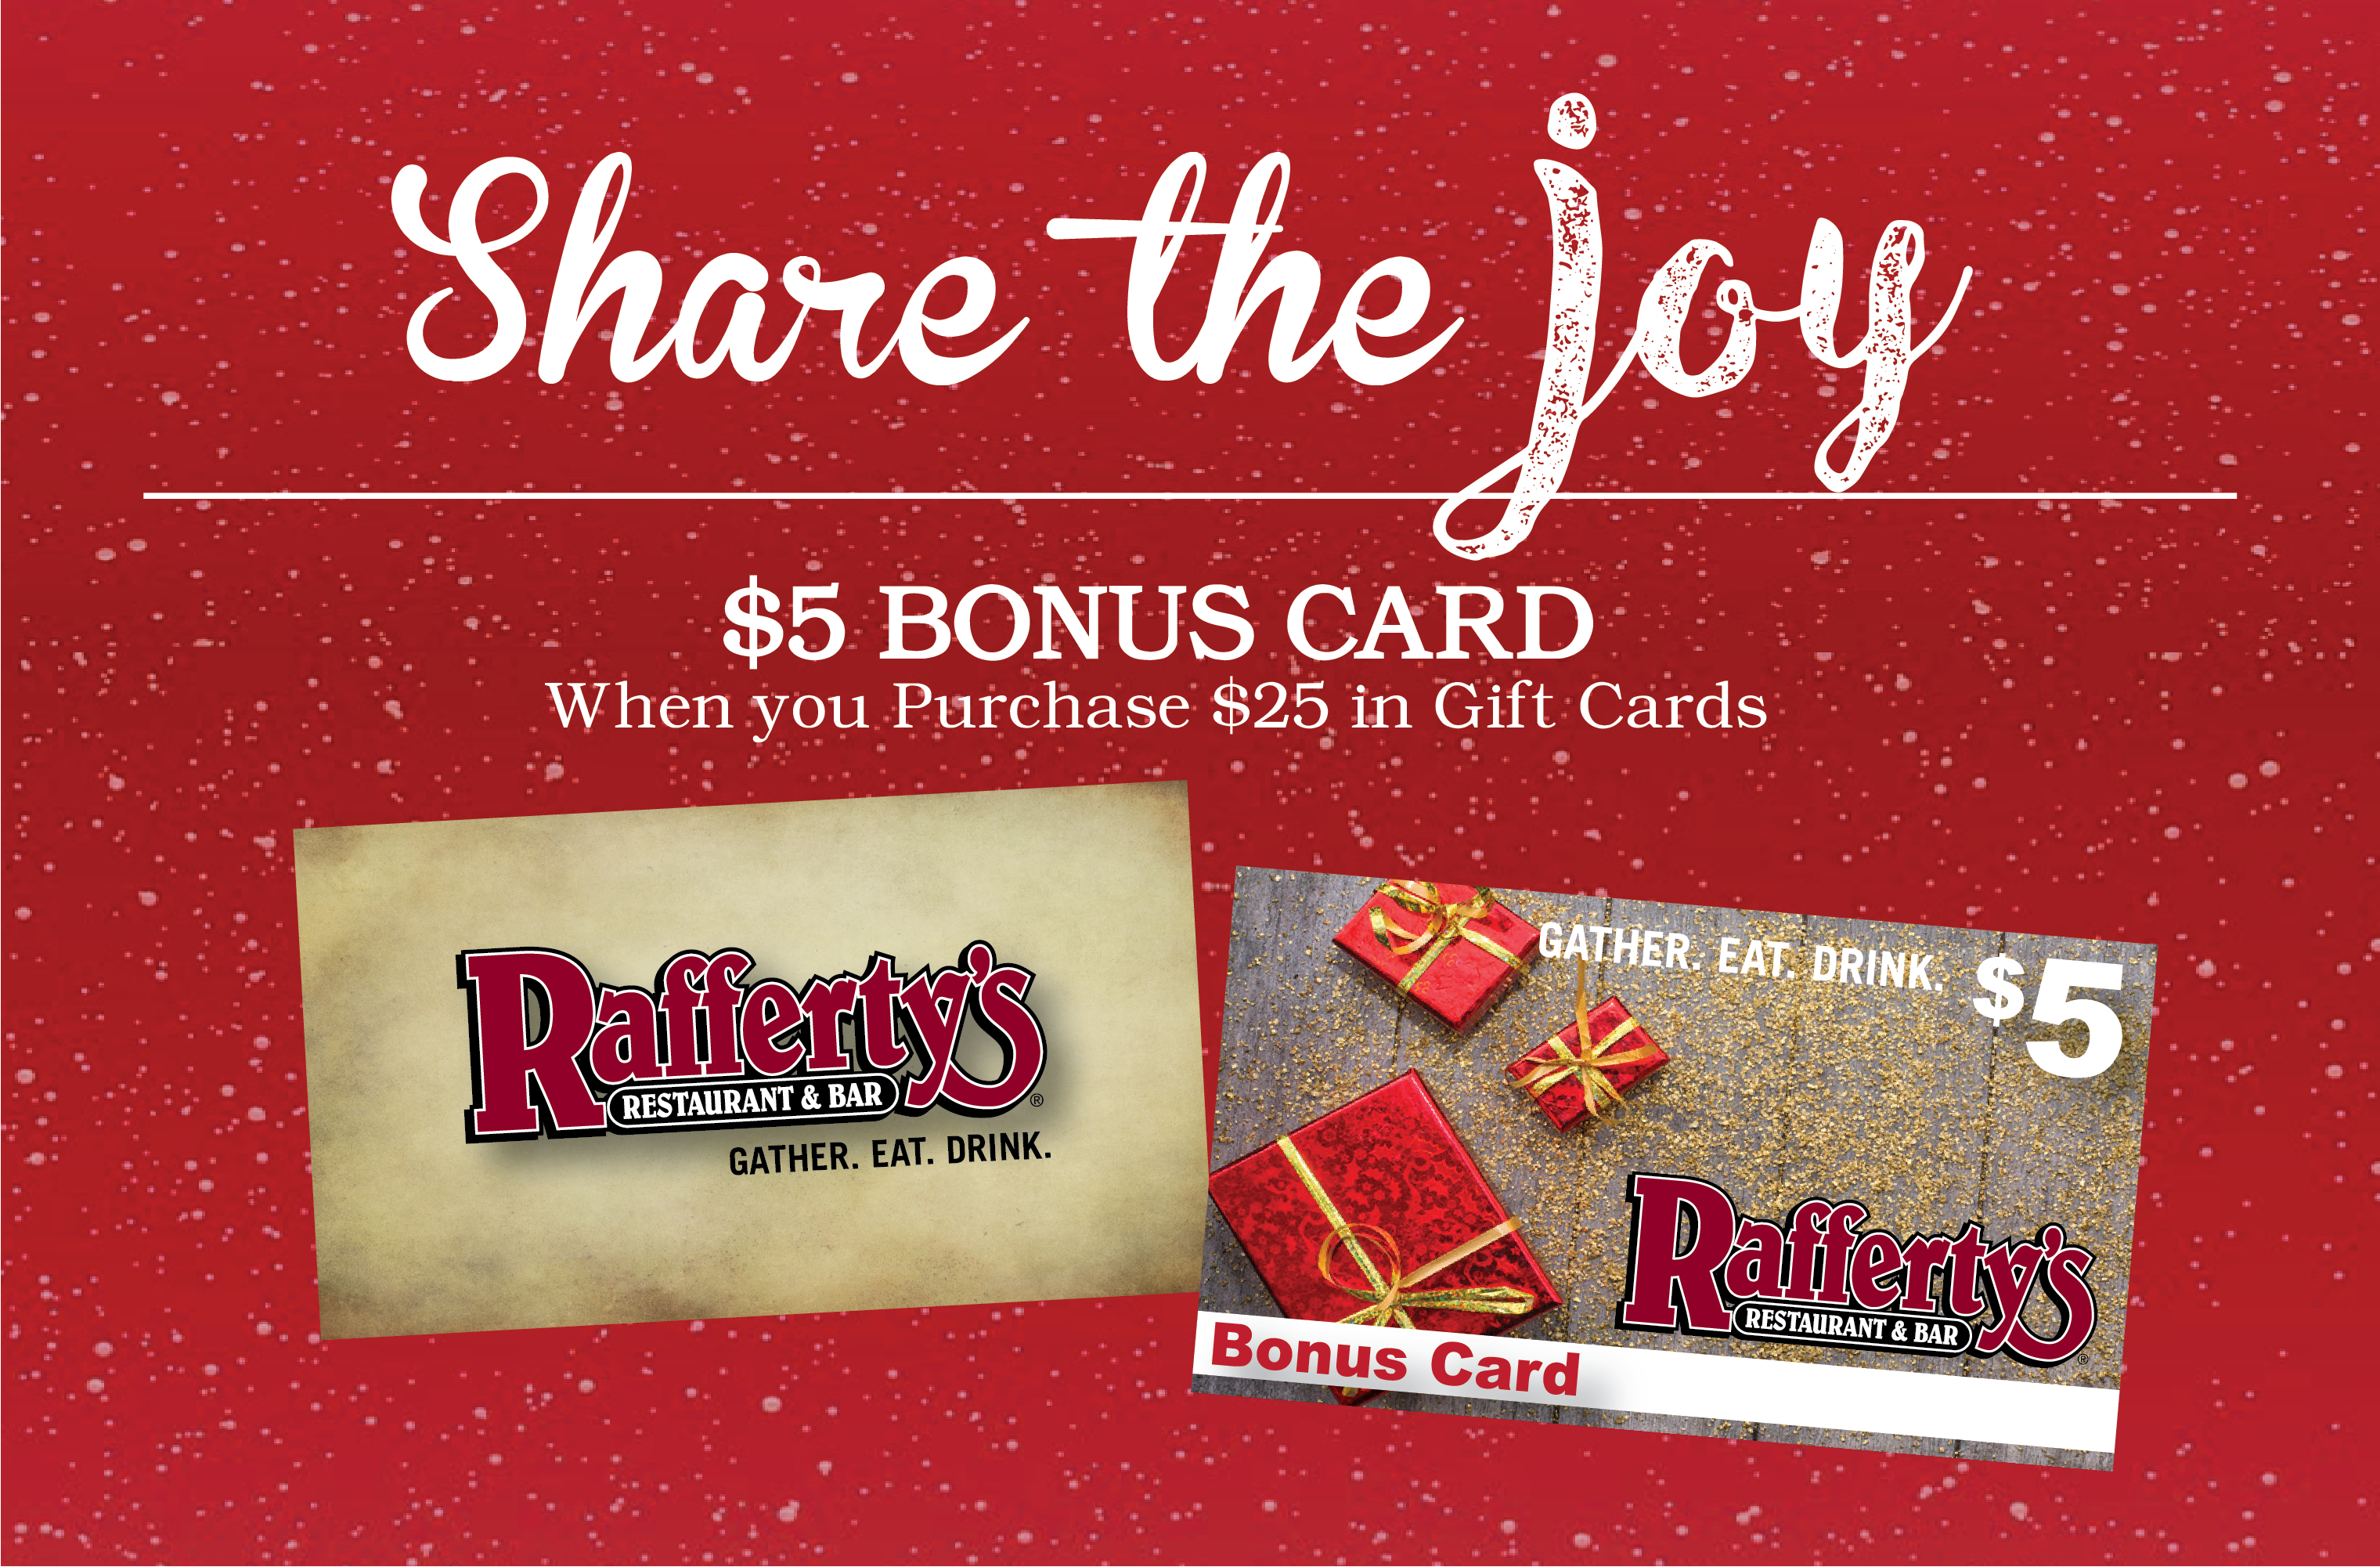 Rafferty's coupons